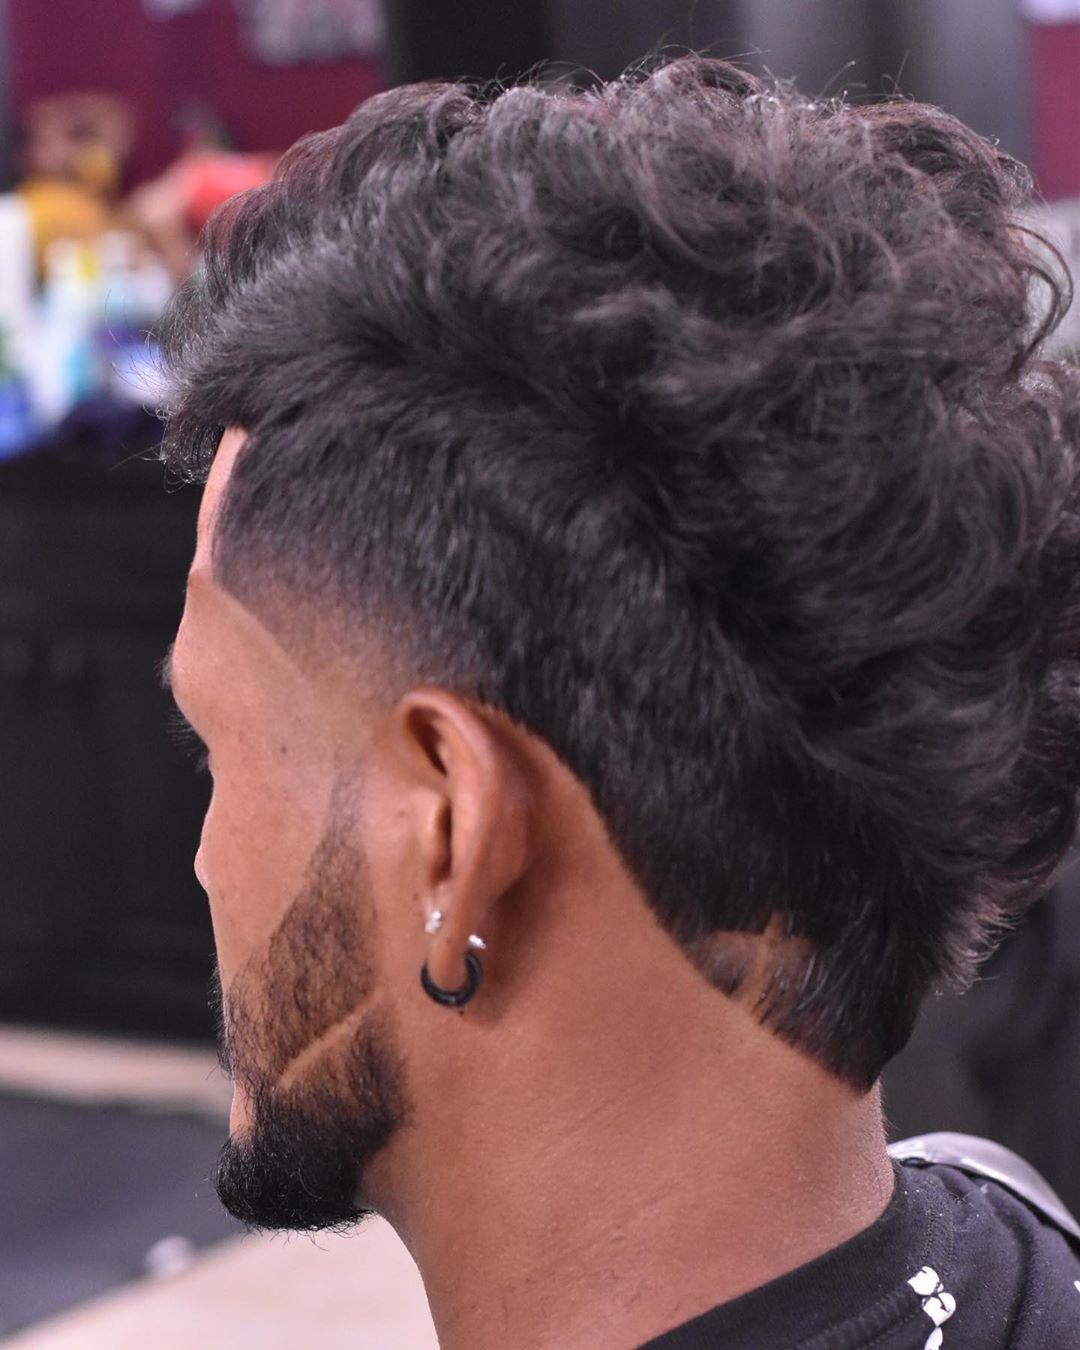 Olbinjt Hairstyles Haircut Barbershopconnect Barbershop